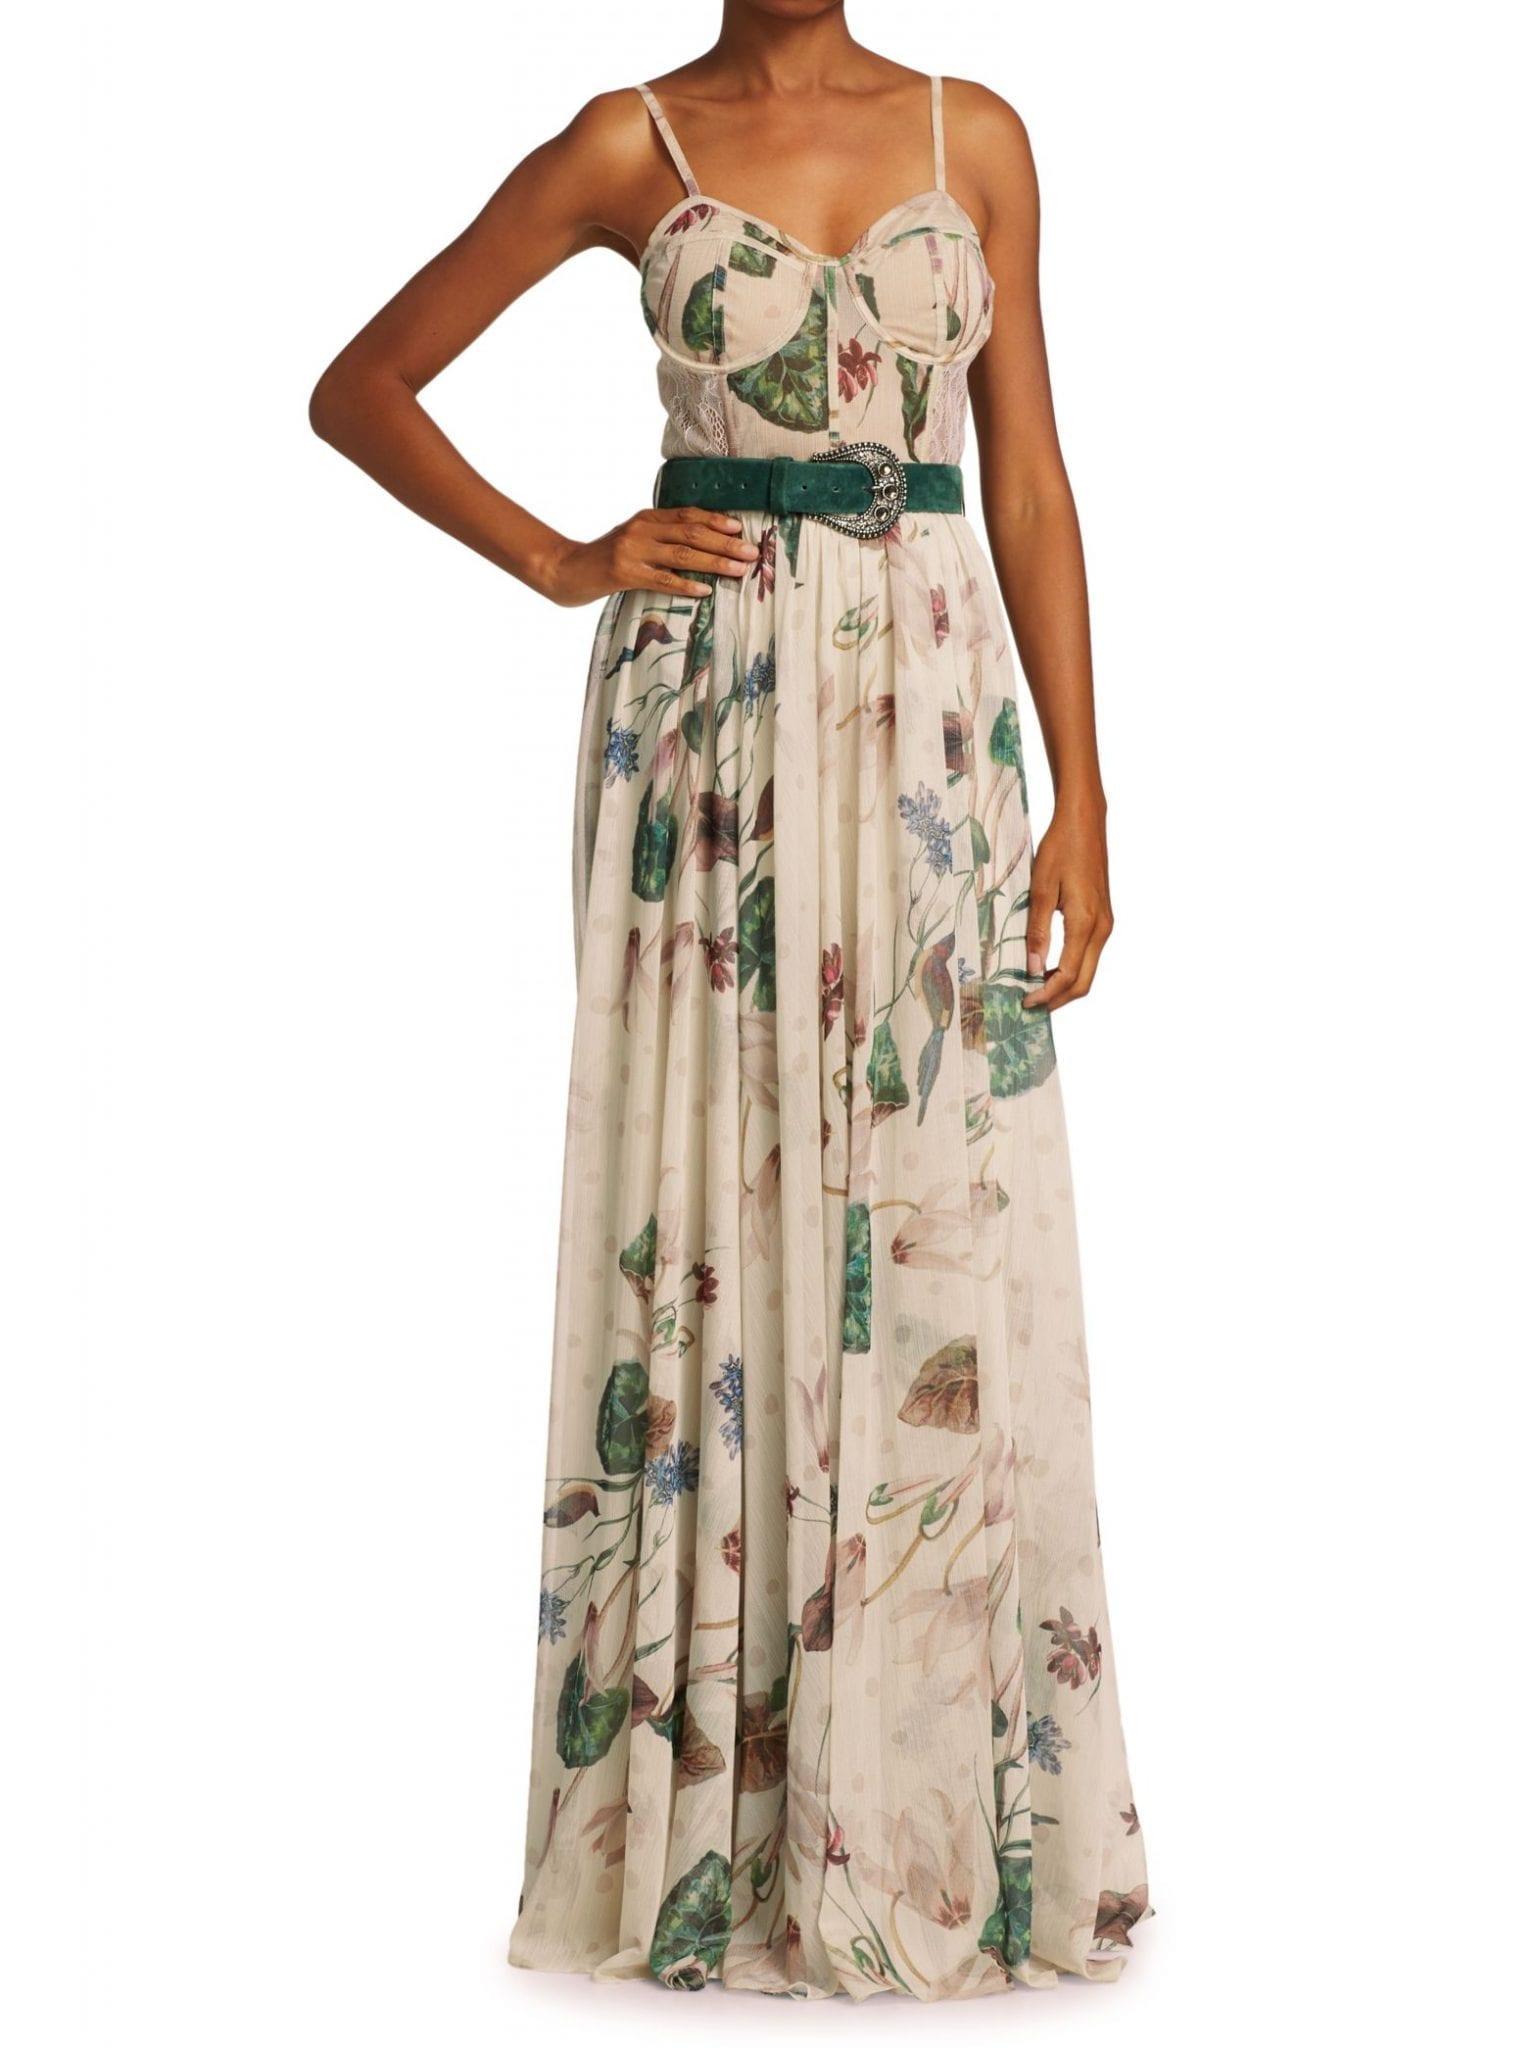 PATBO Sophia Belted Bustier Maxi Dress